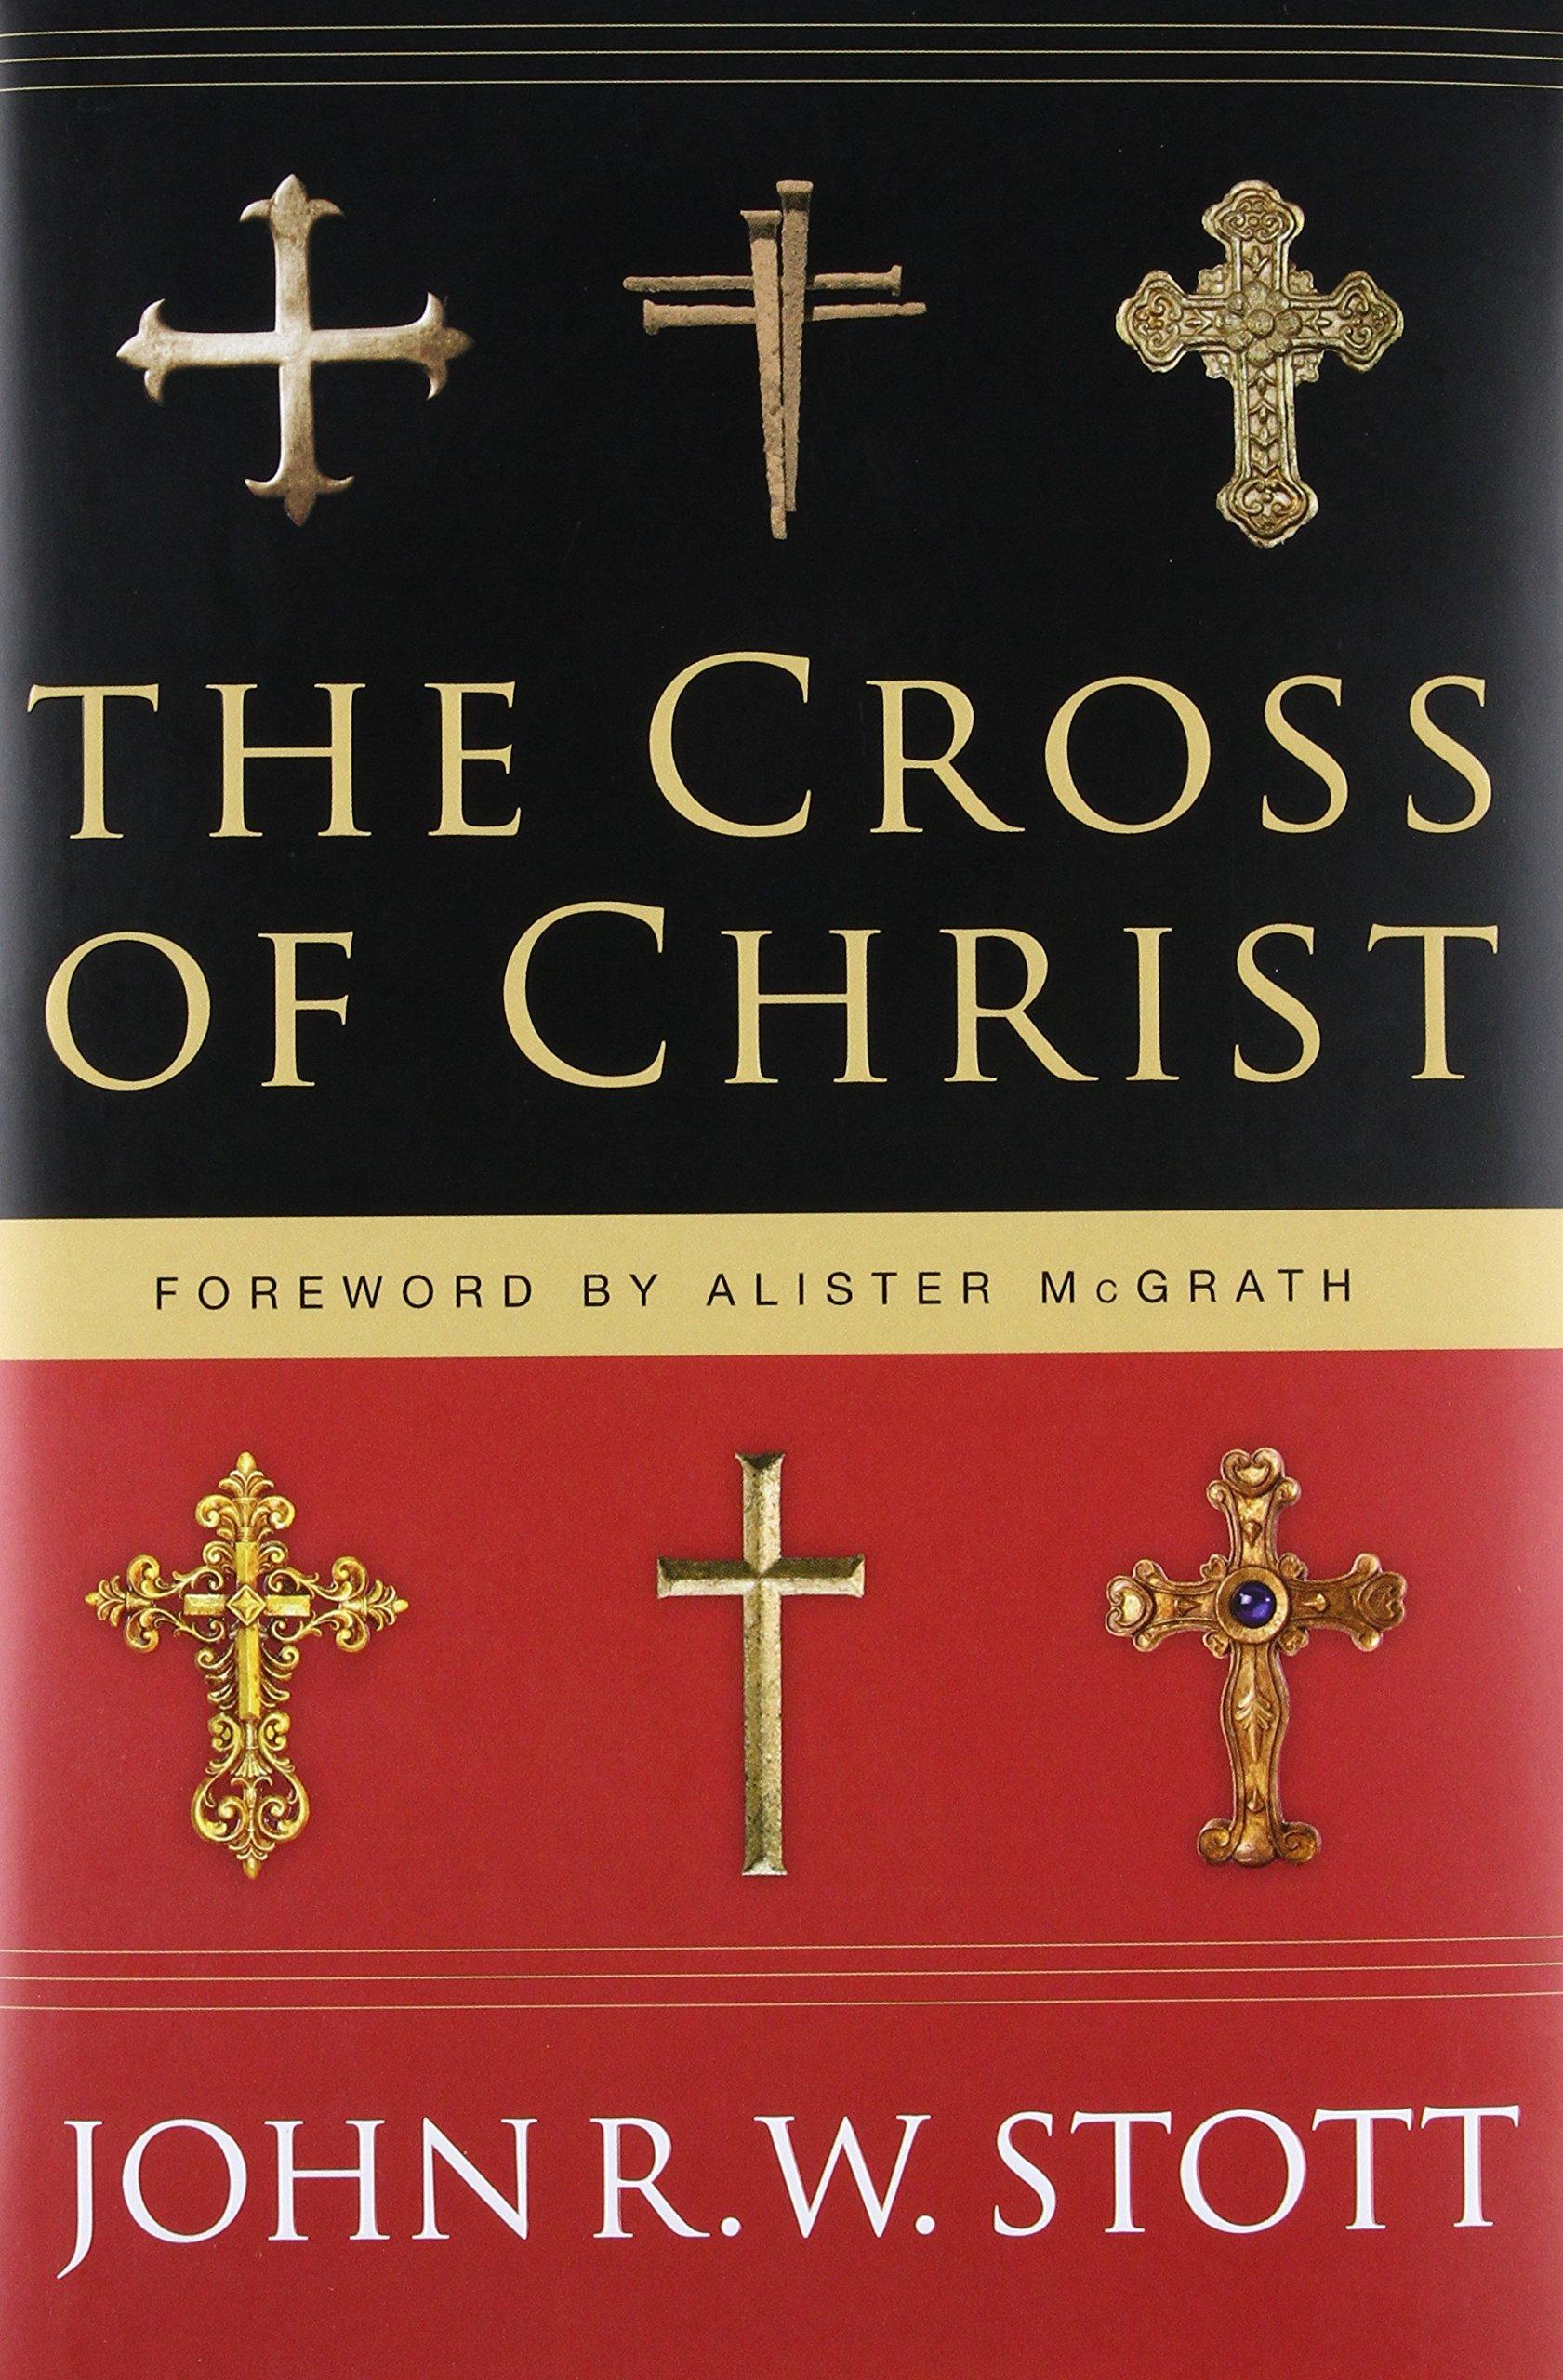 the cross of christ john stott 9780830833207 amazon com books